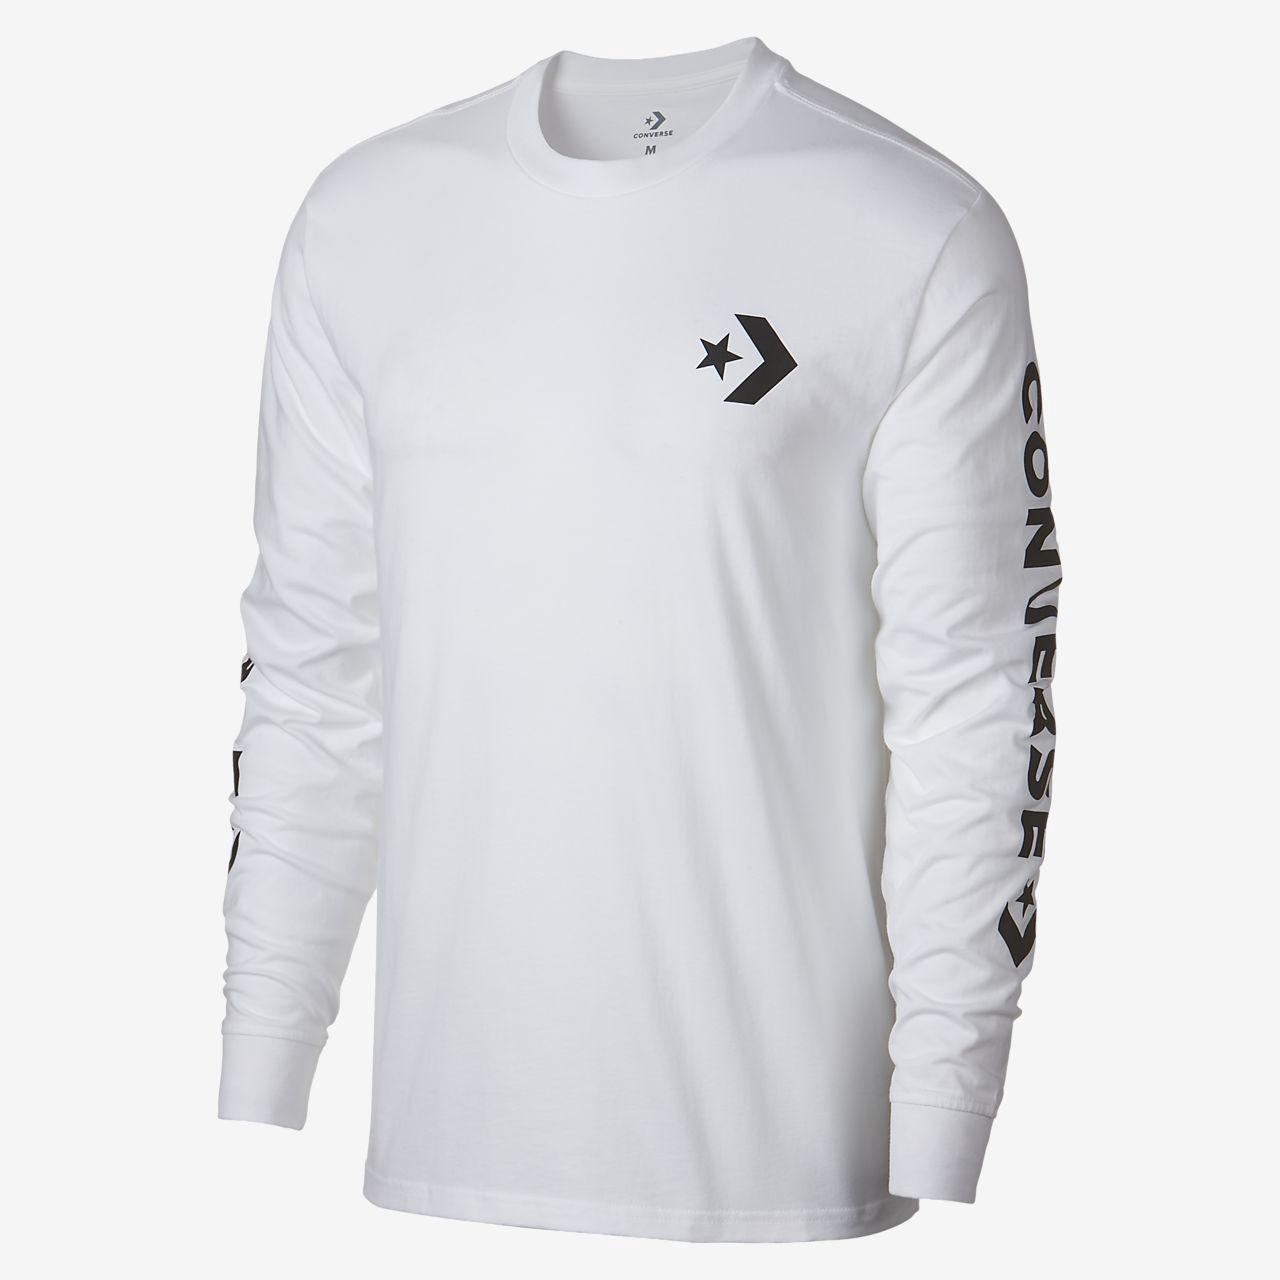 698b8778ed78 Converse Star Chevron Wordmark Men s Long Sleeve T-Shirt - XL ...